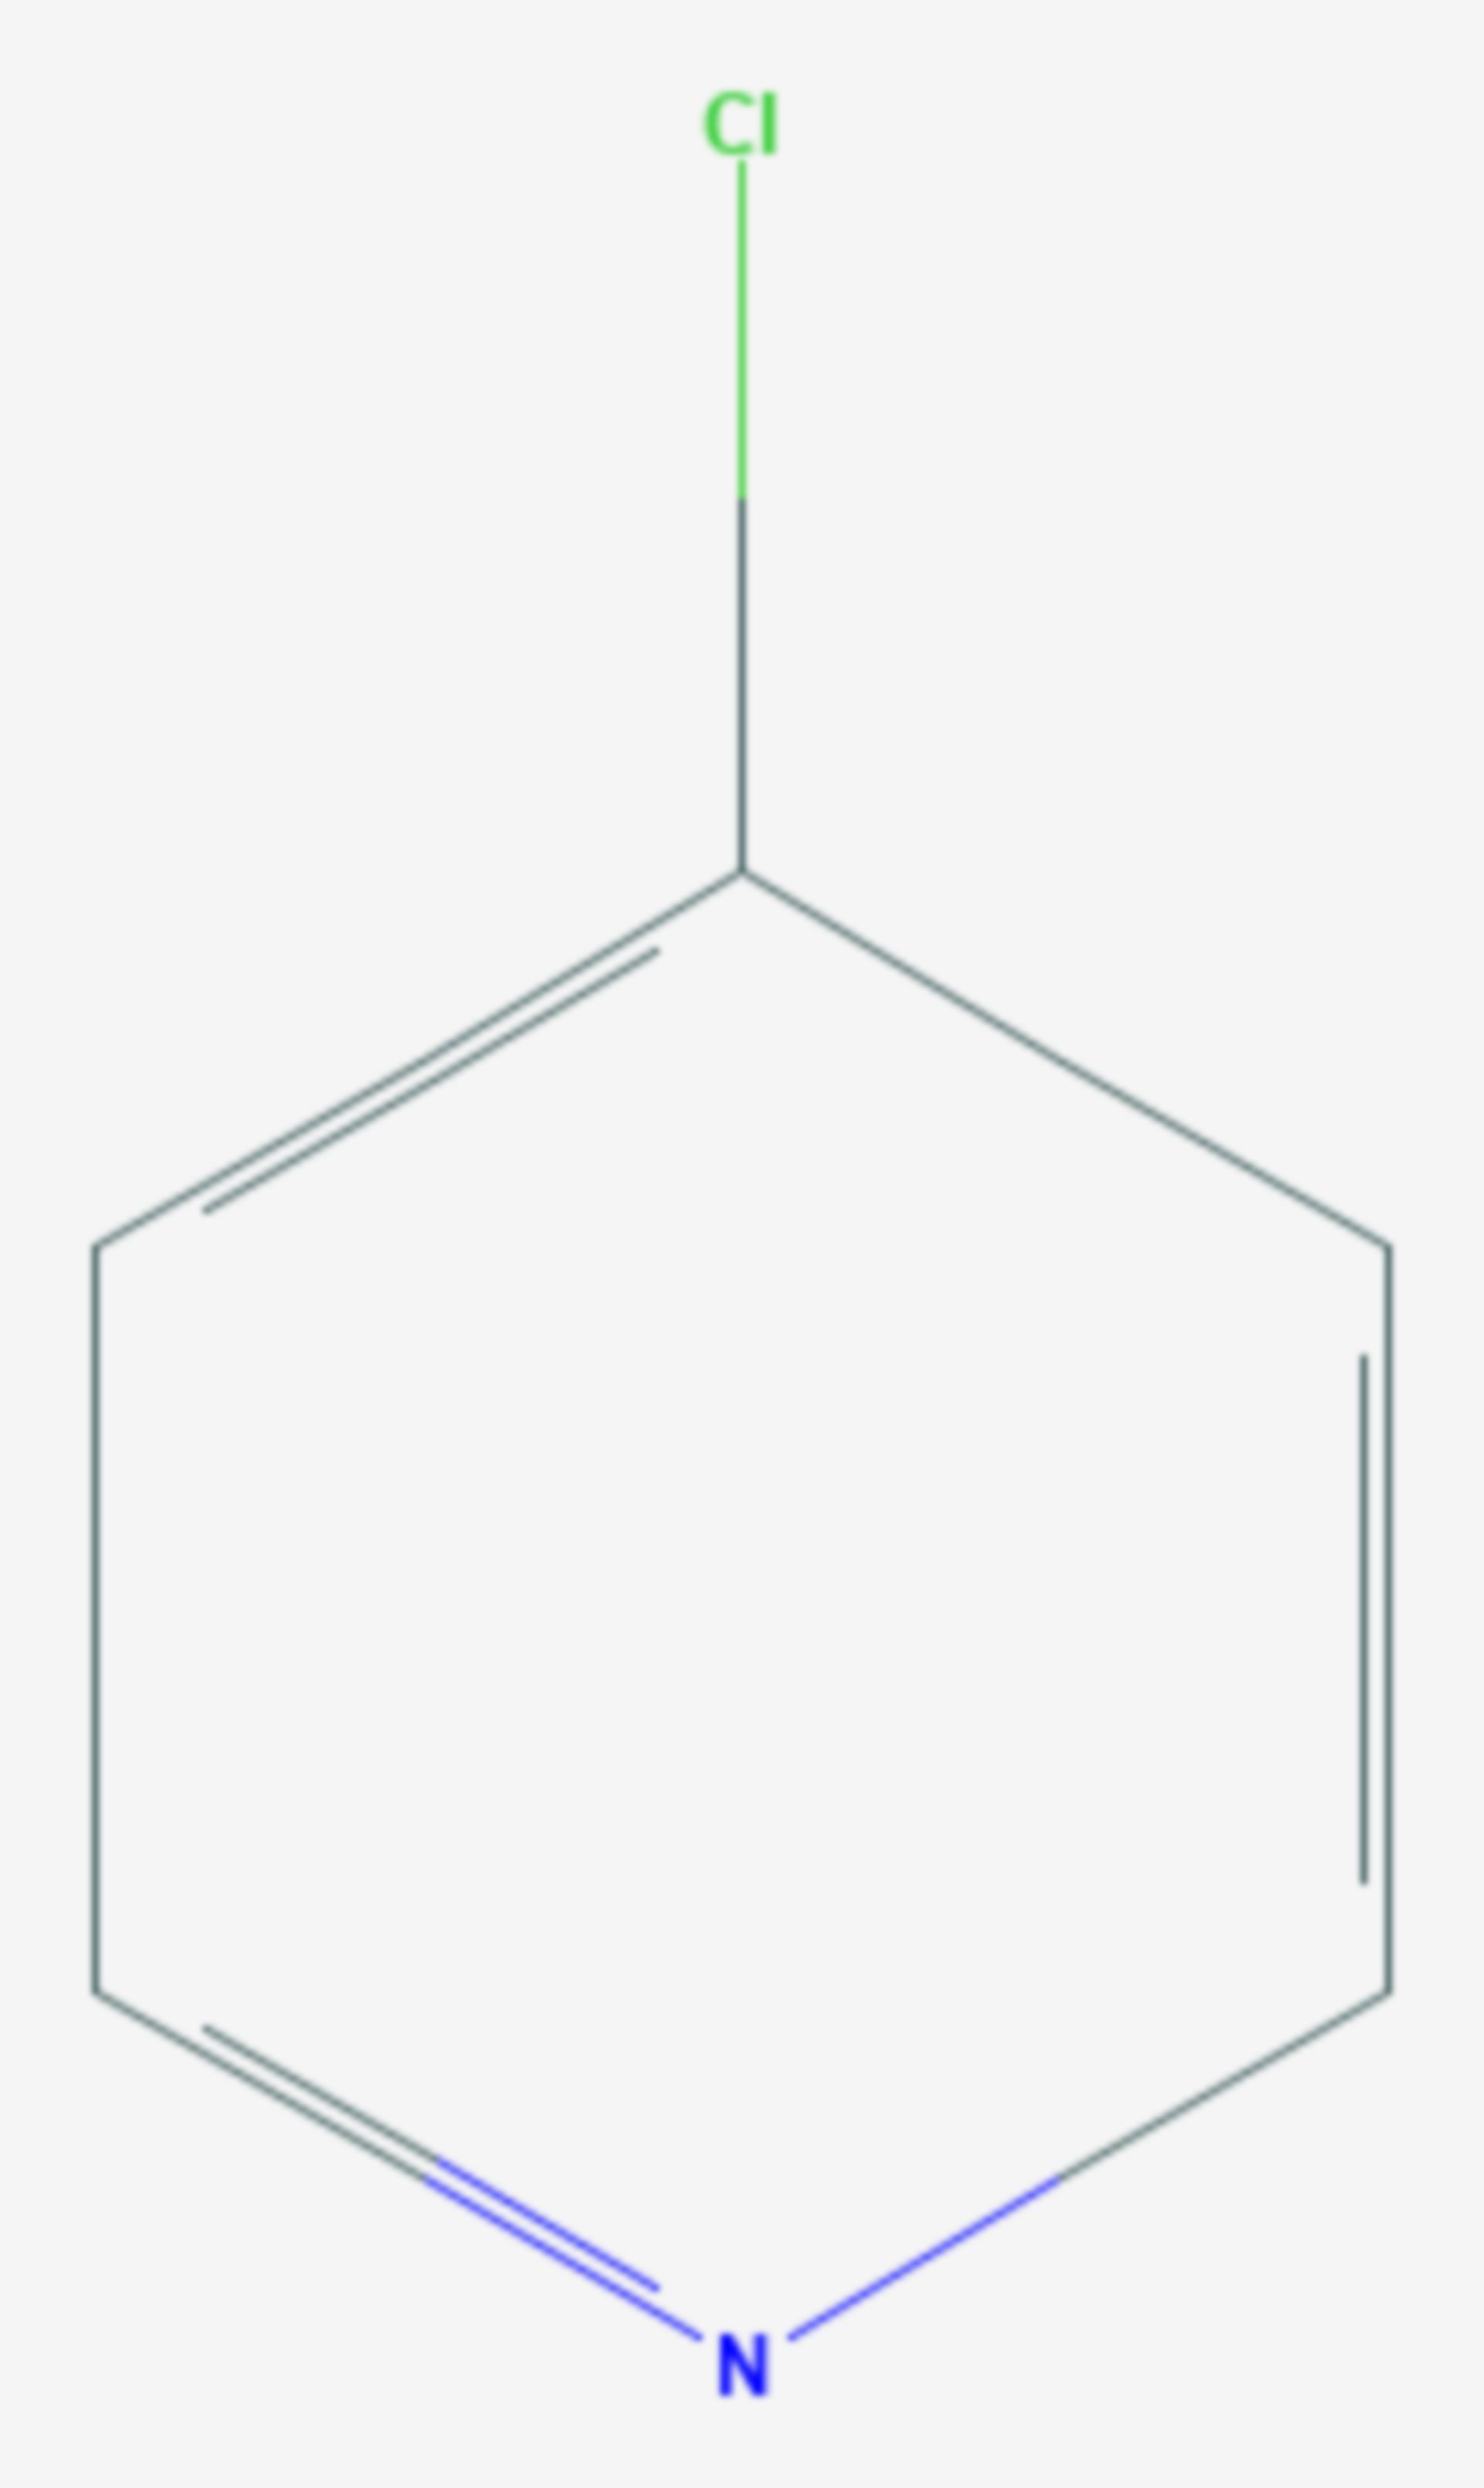 4-Chlorpyridin (Strukturformel)